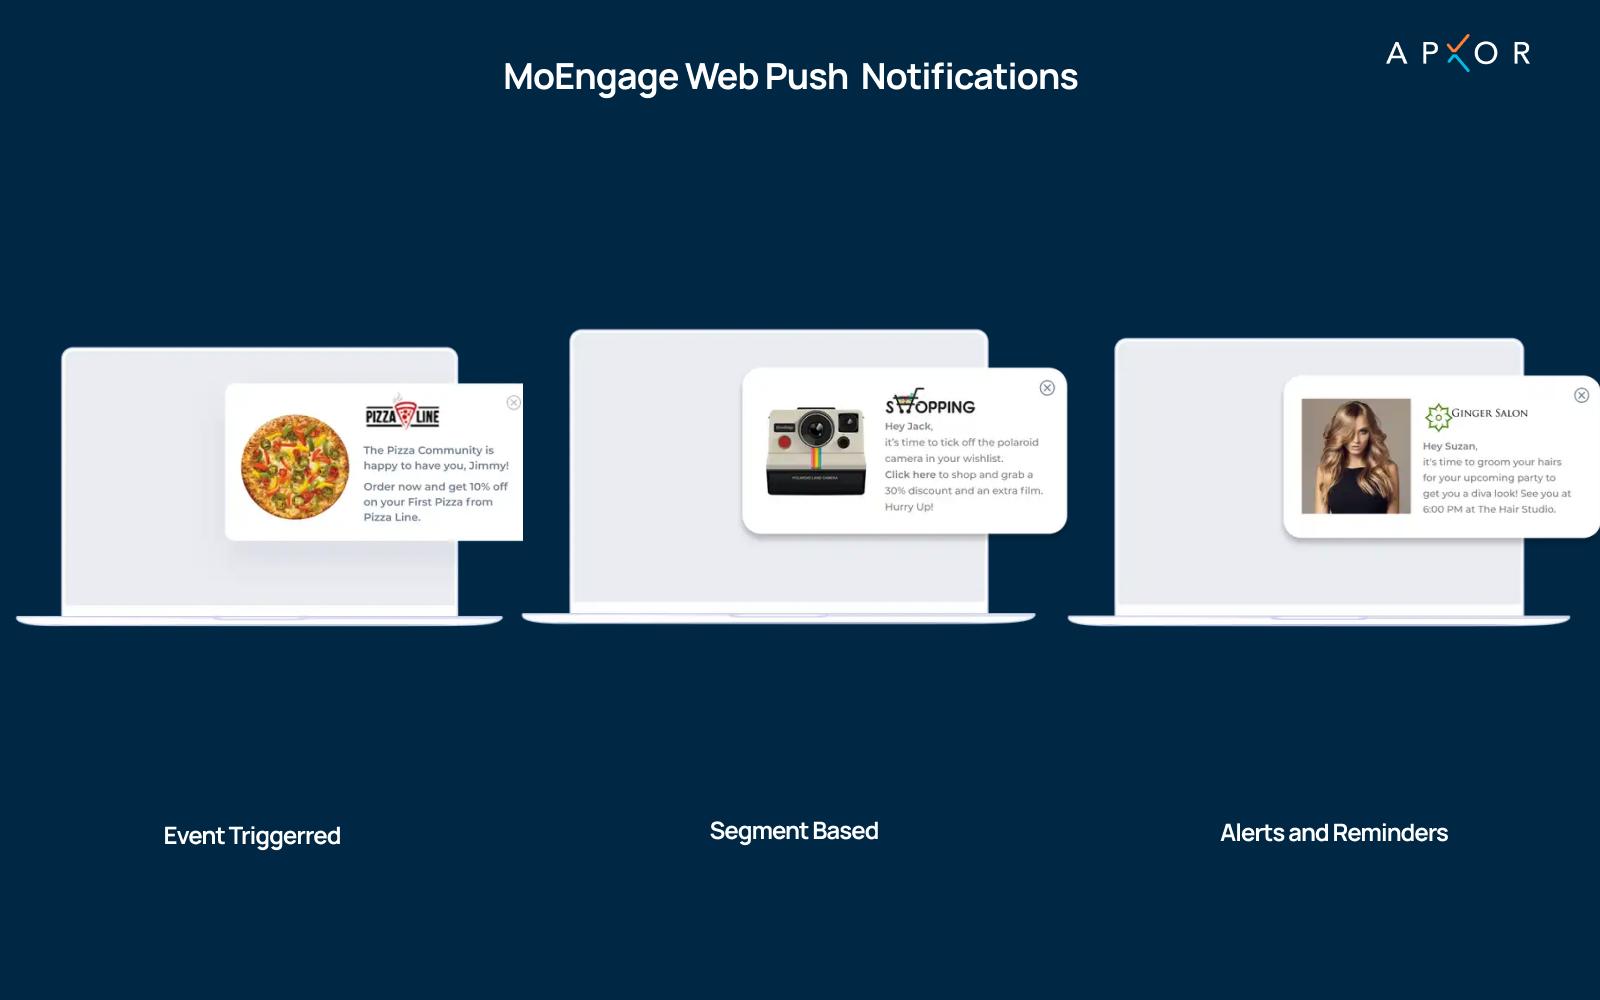 MoEngage's Web Push Notifications - Apxor